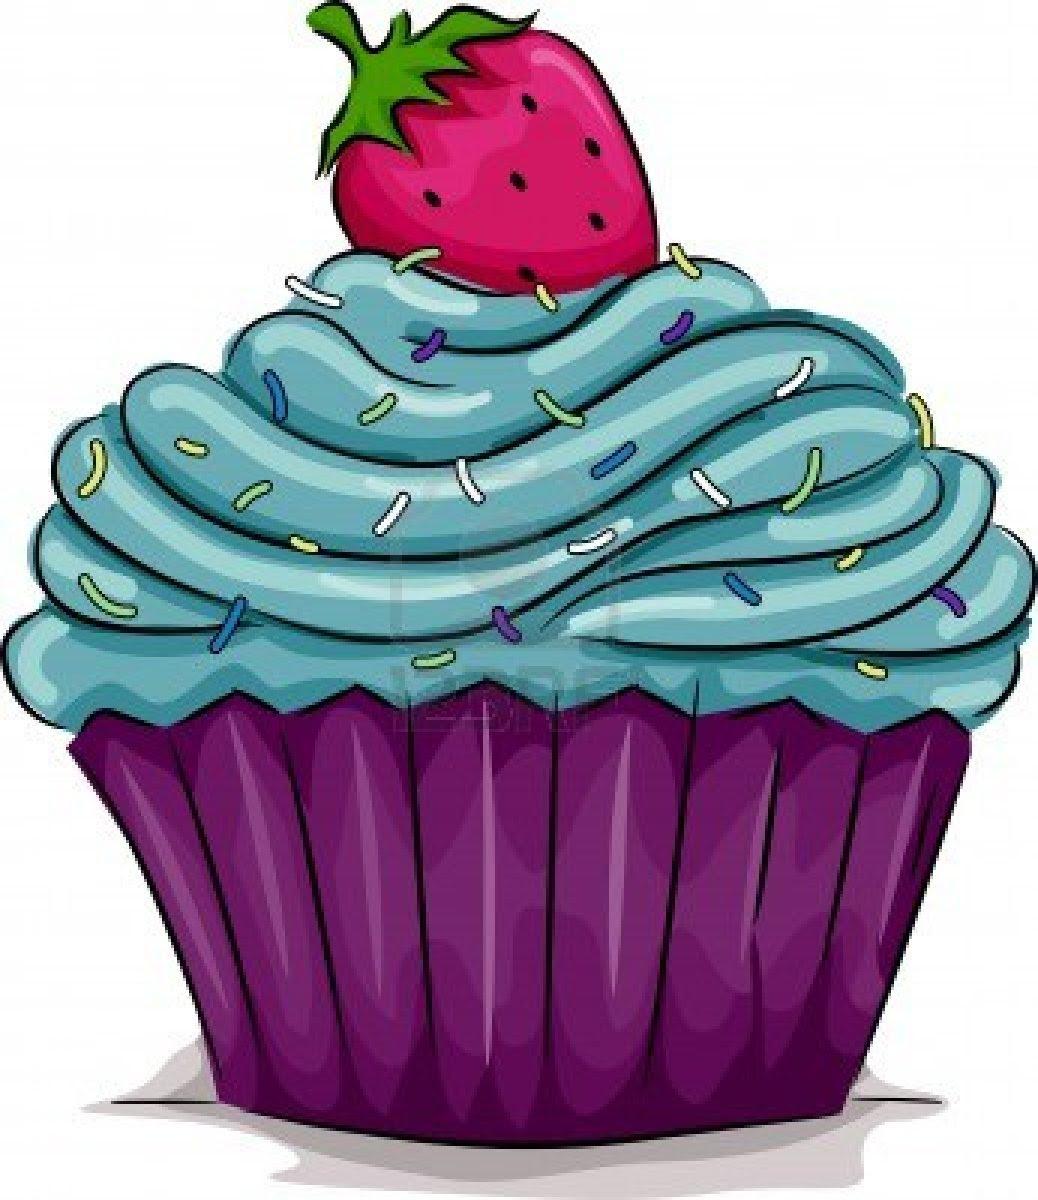 Cake Clip Art Royalty Free Gograph